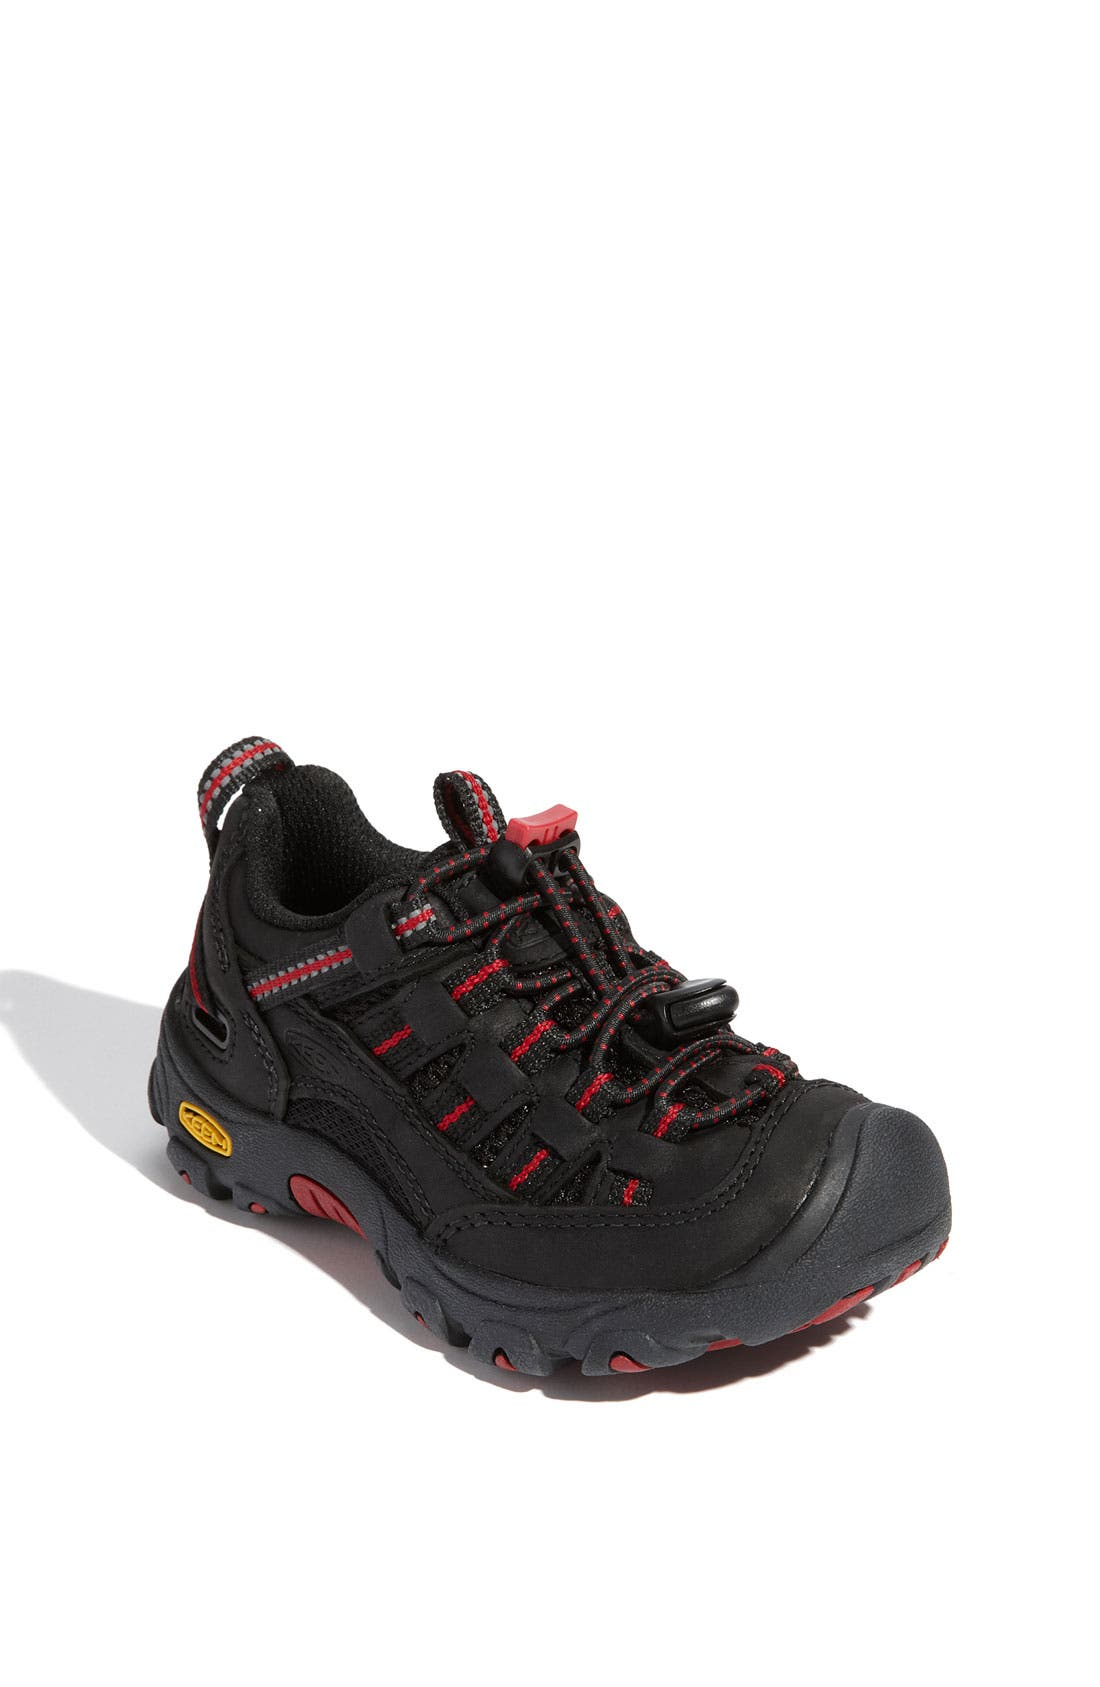 Main Image - Keen 'Alamosa' Sneaker (Toddler, Little Kid & Big Kid)